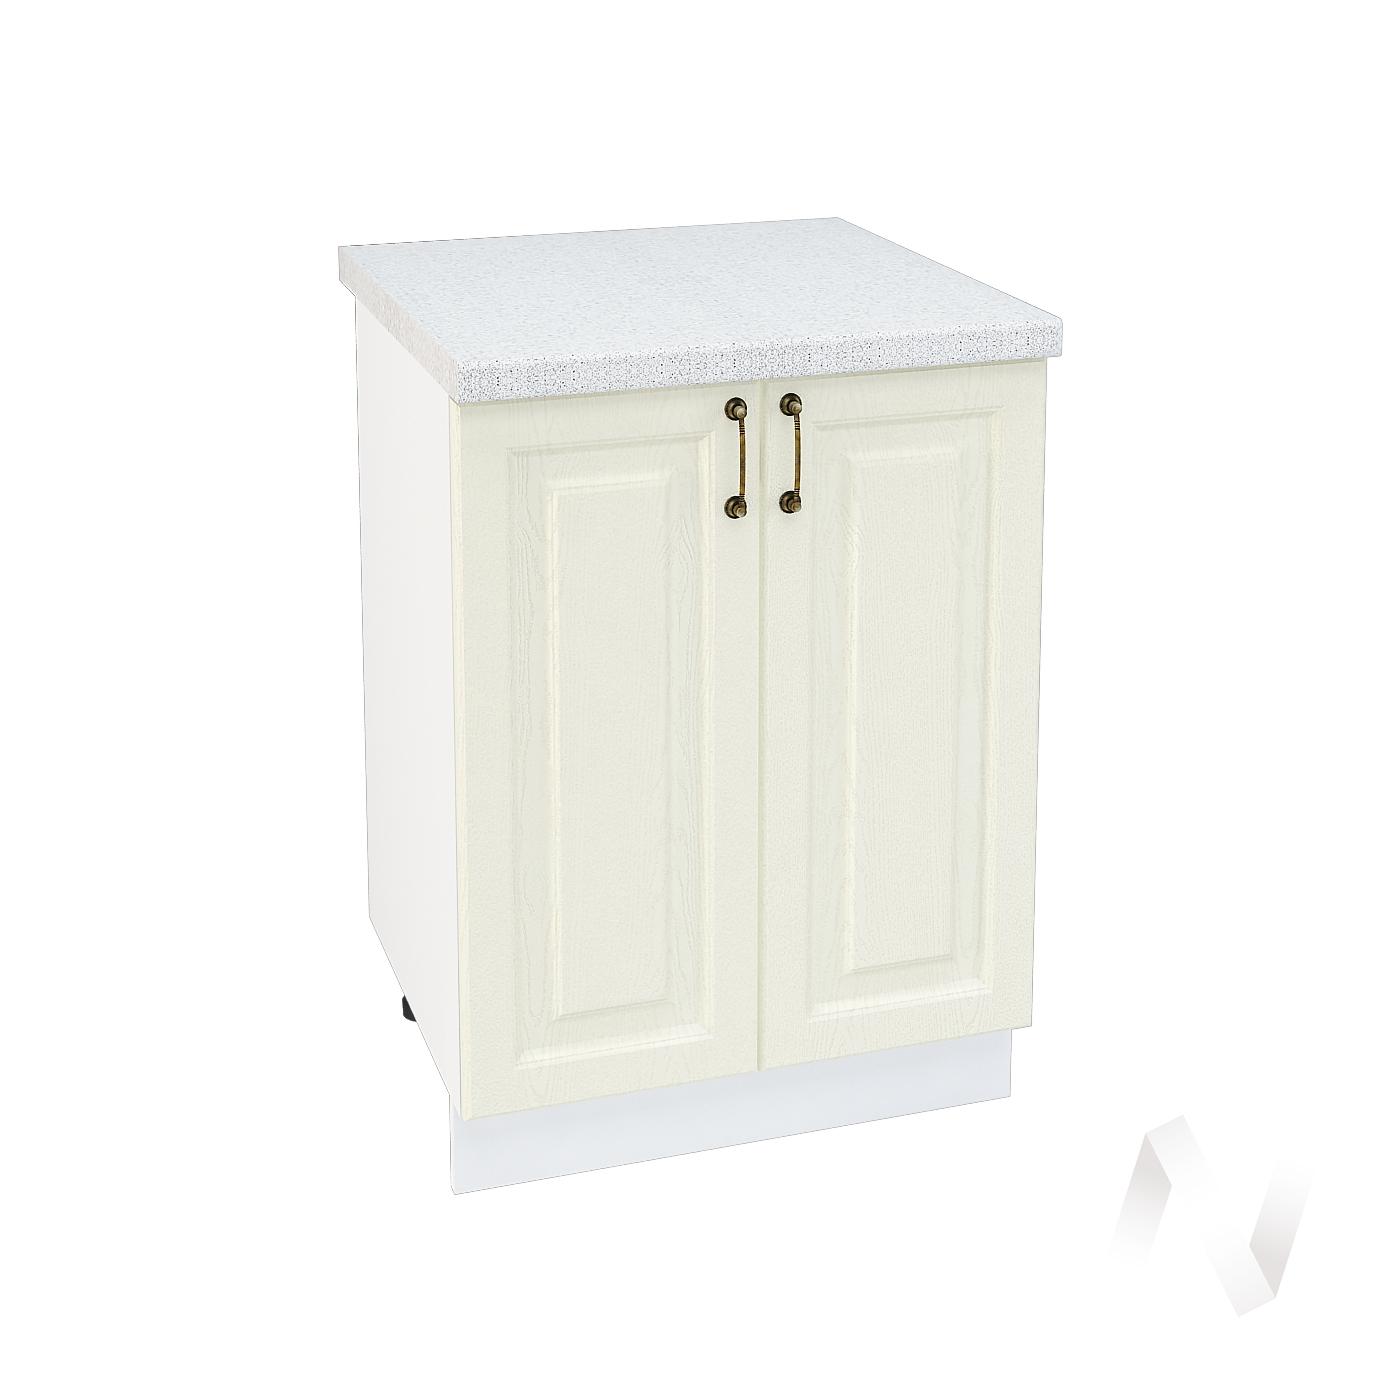 "Кухня ""Ницца"": Шкаф нижний 600, ШН 600 (Крем/корпус белый)"